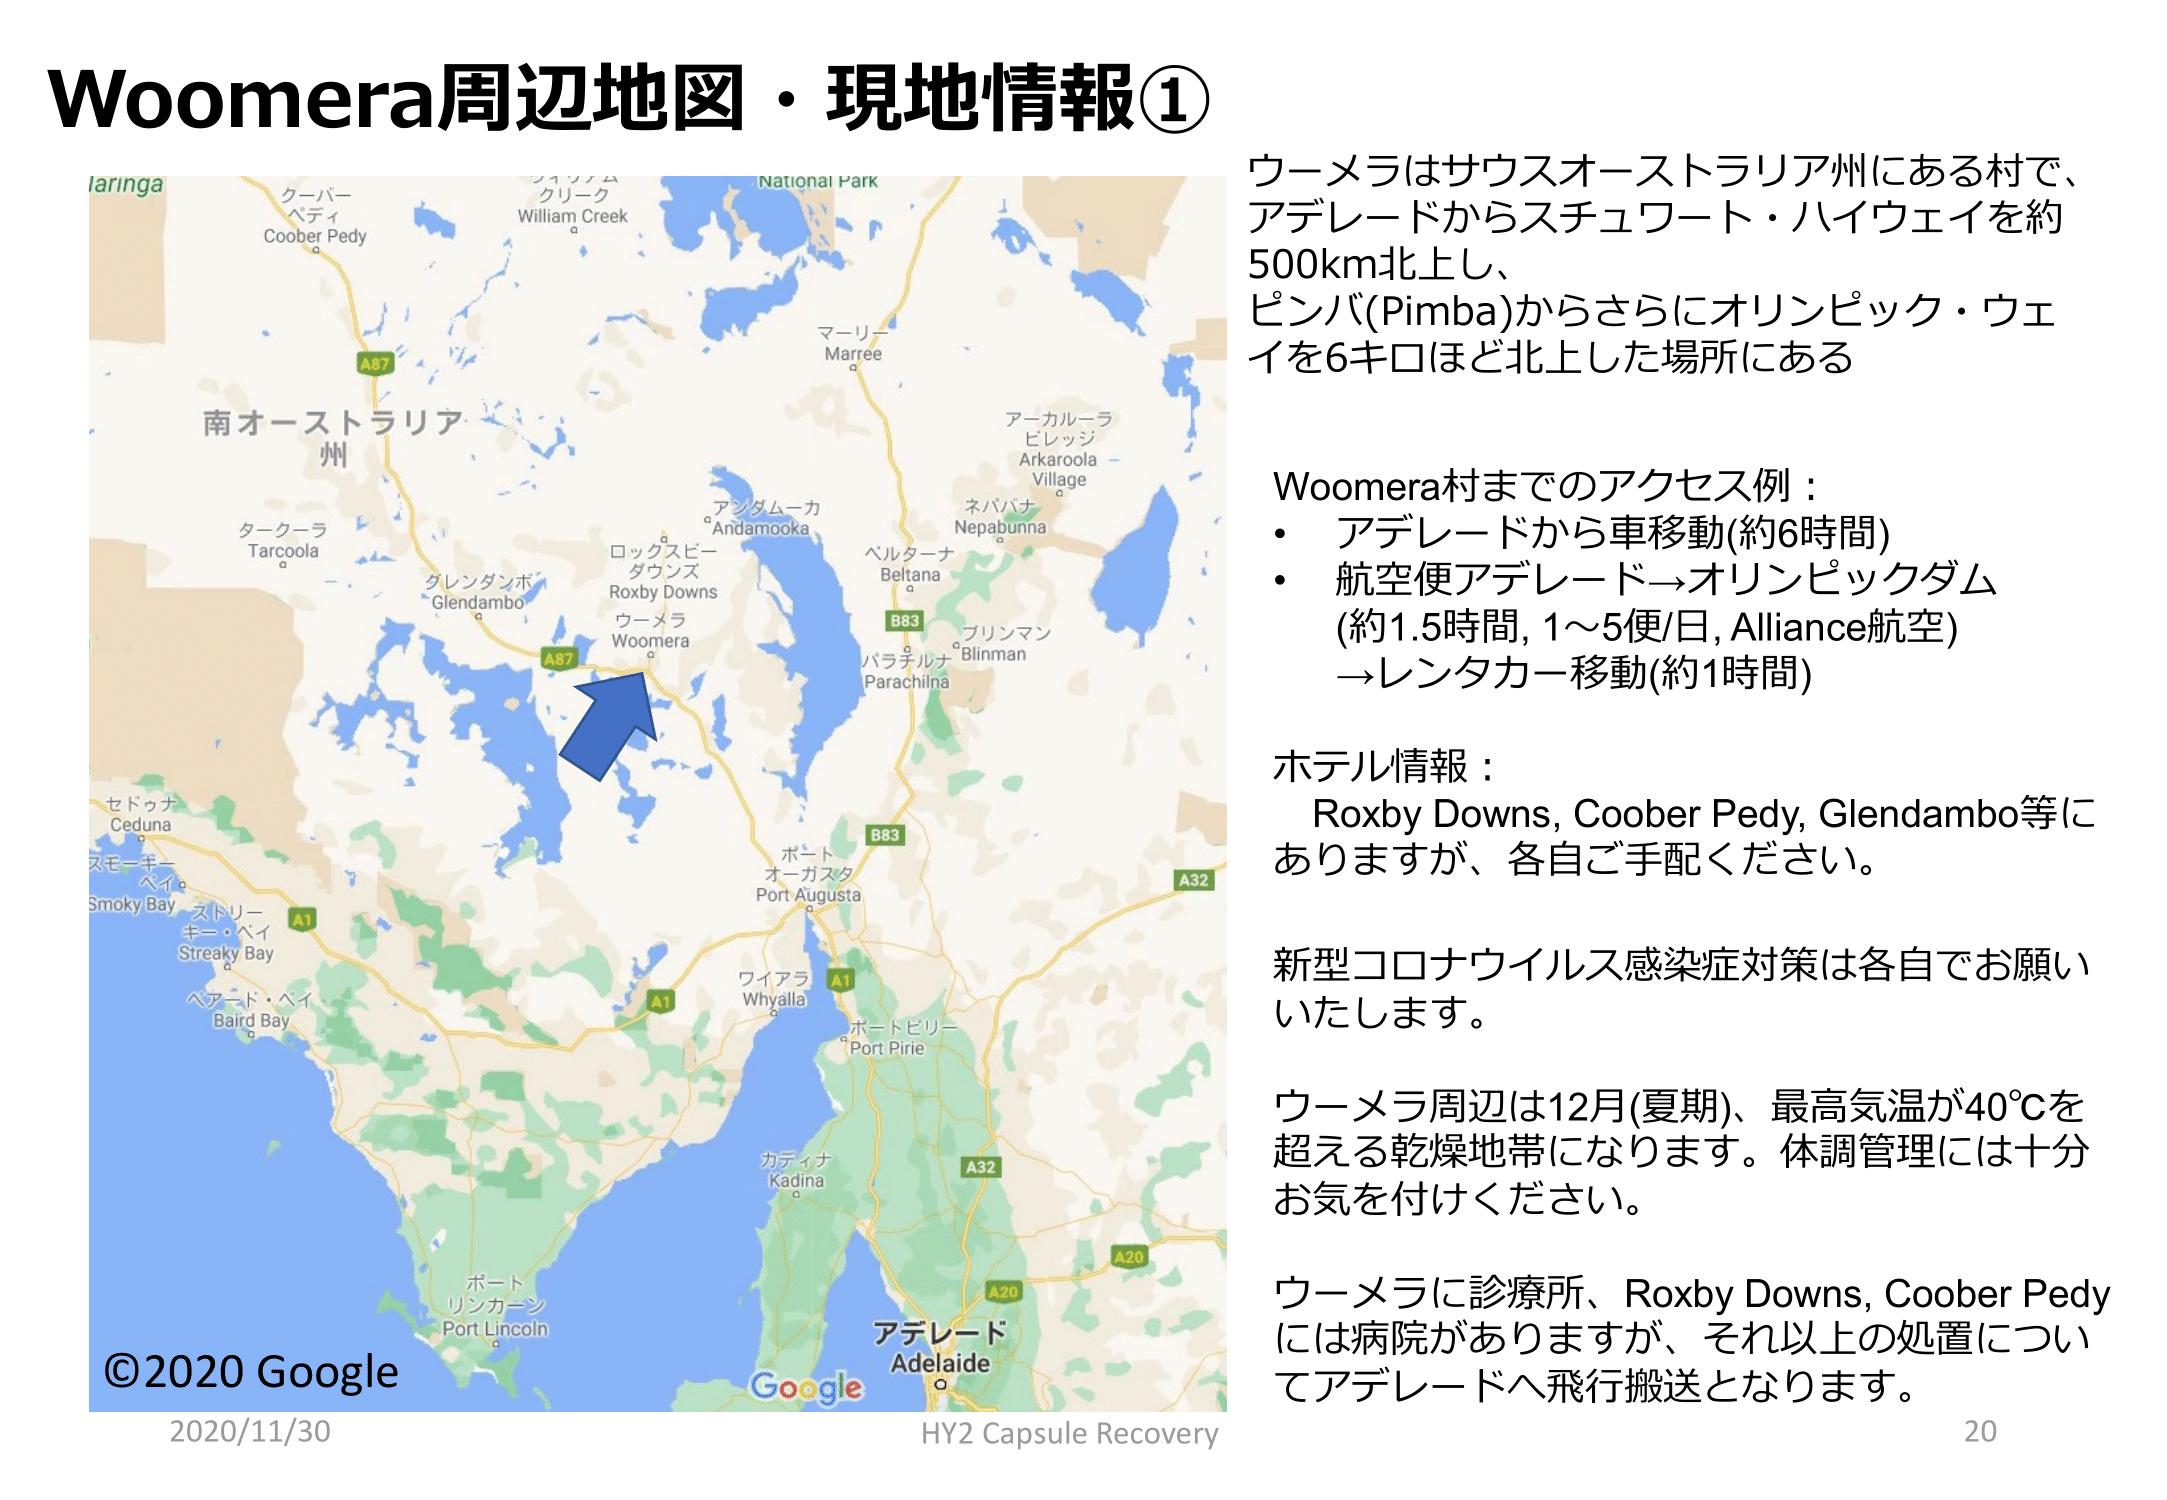 f:id:Imamura:20201130154526p:plain:h250